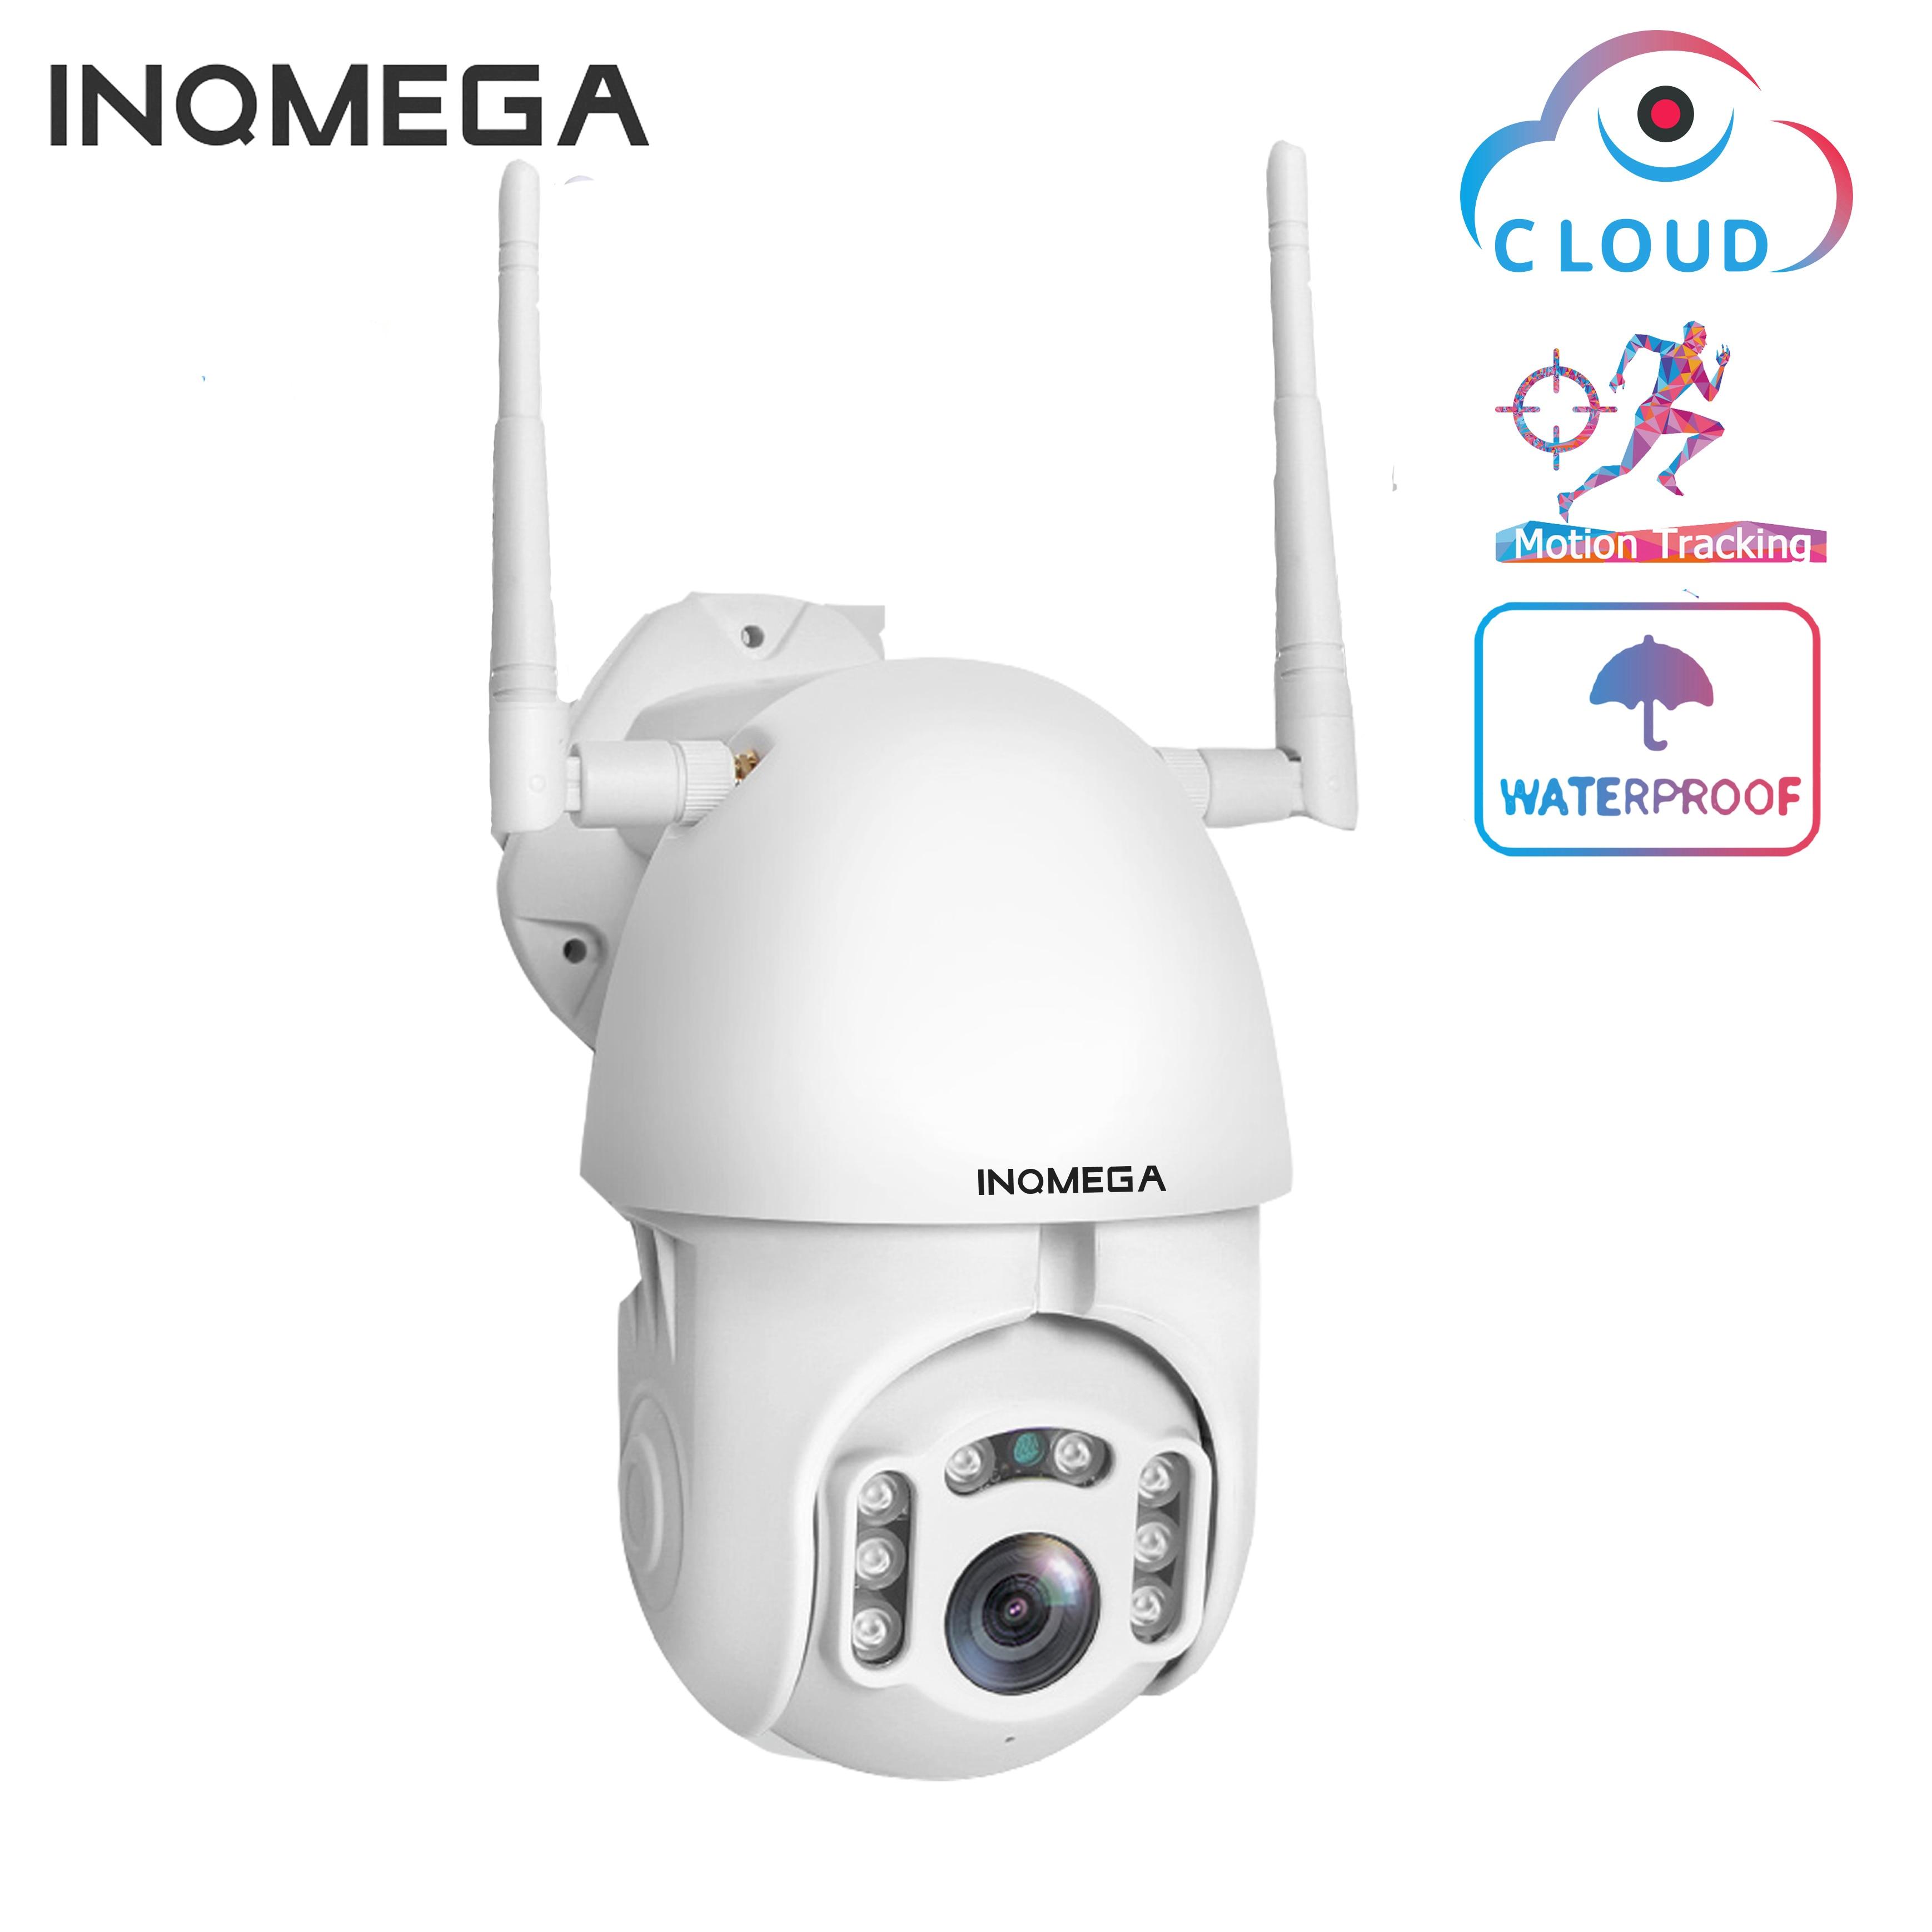 INQMEGA 1080P IP Camera WiFi Wireless Auto tracking PTZ Speed Dome Camera Outdoor CCTV Security Surveillance